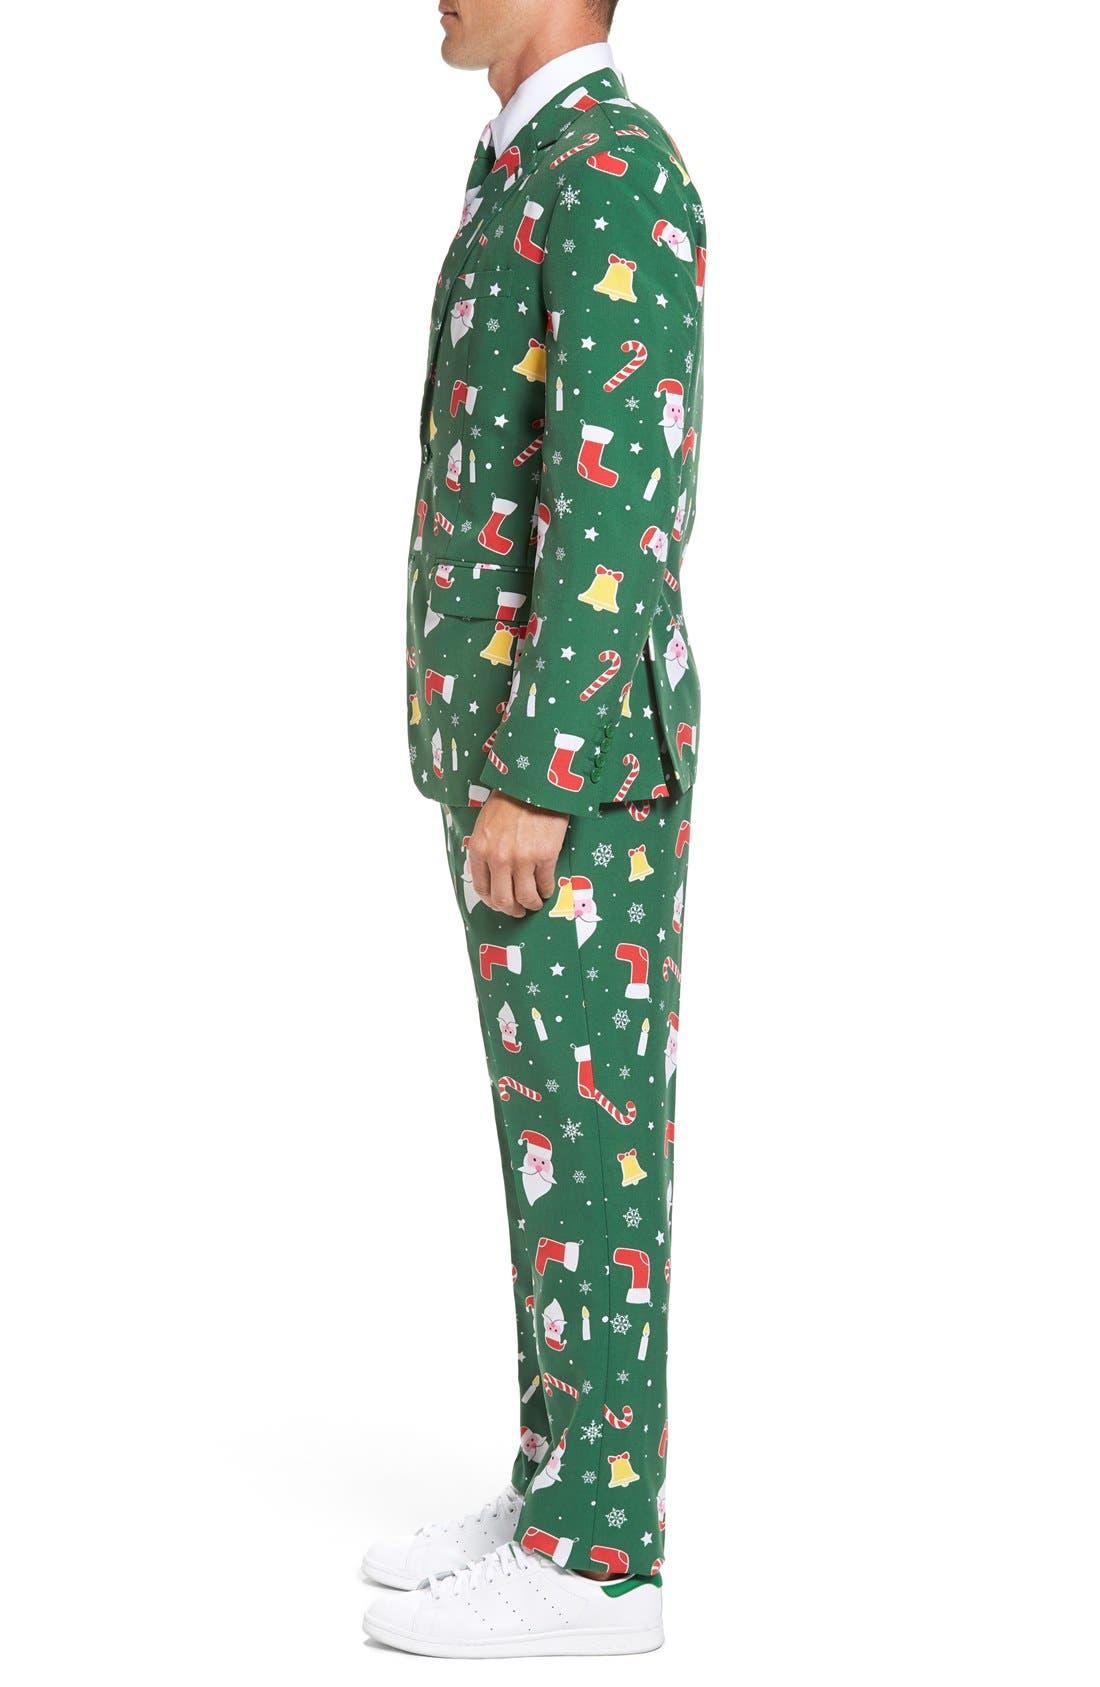 'Santaboss' Trim Fit Two-Piece Suit with Tie,                             Alternate thumbnail 4, color,                             301